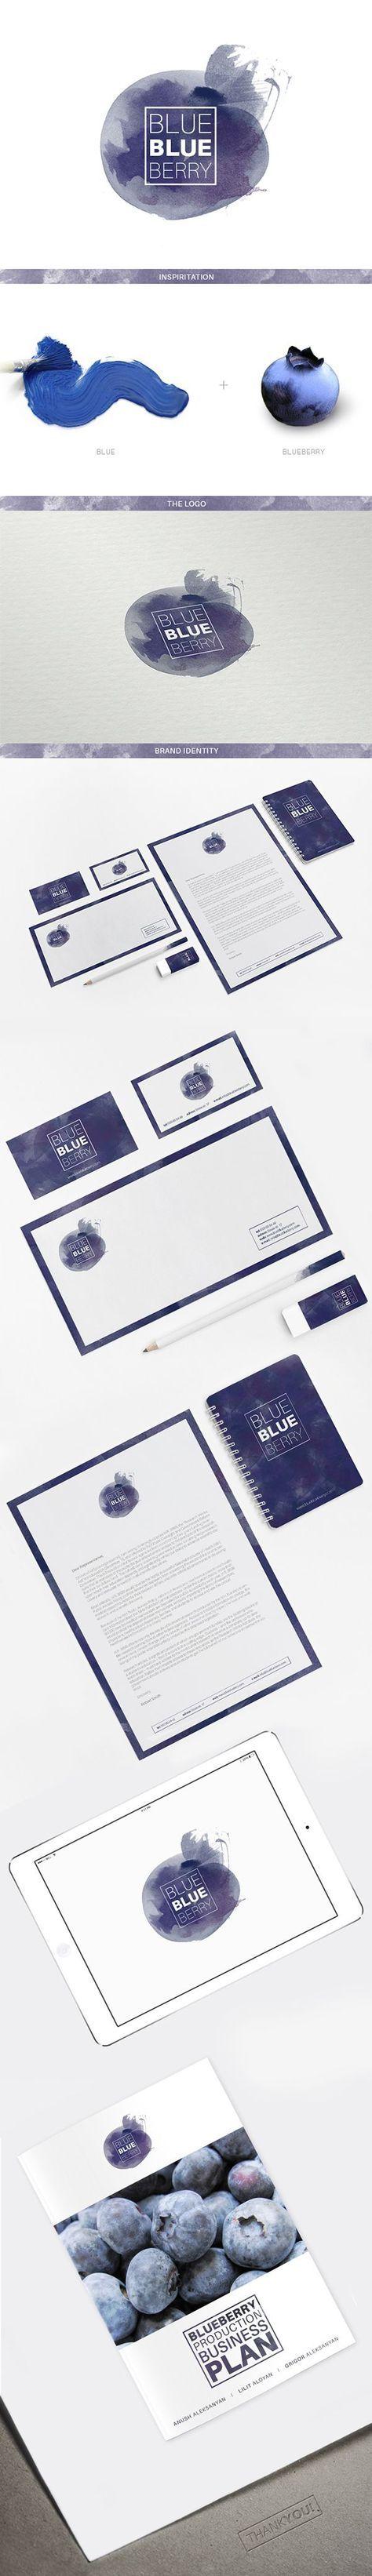 BlueBlueBerry / identity / branding / logo / stationary / fruit / restaurant / business card / inspiration / fun but still beautiful - love this design!: